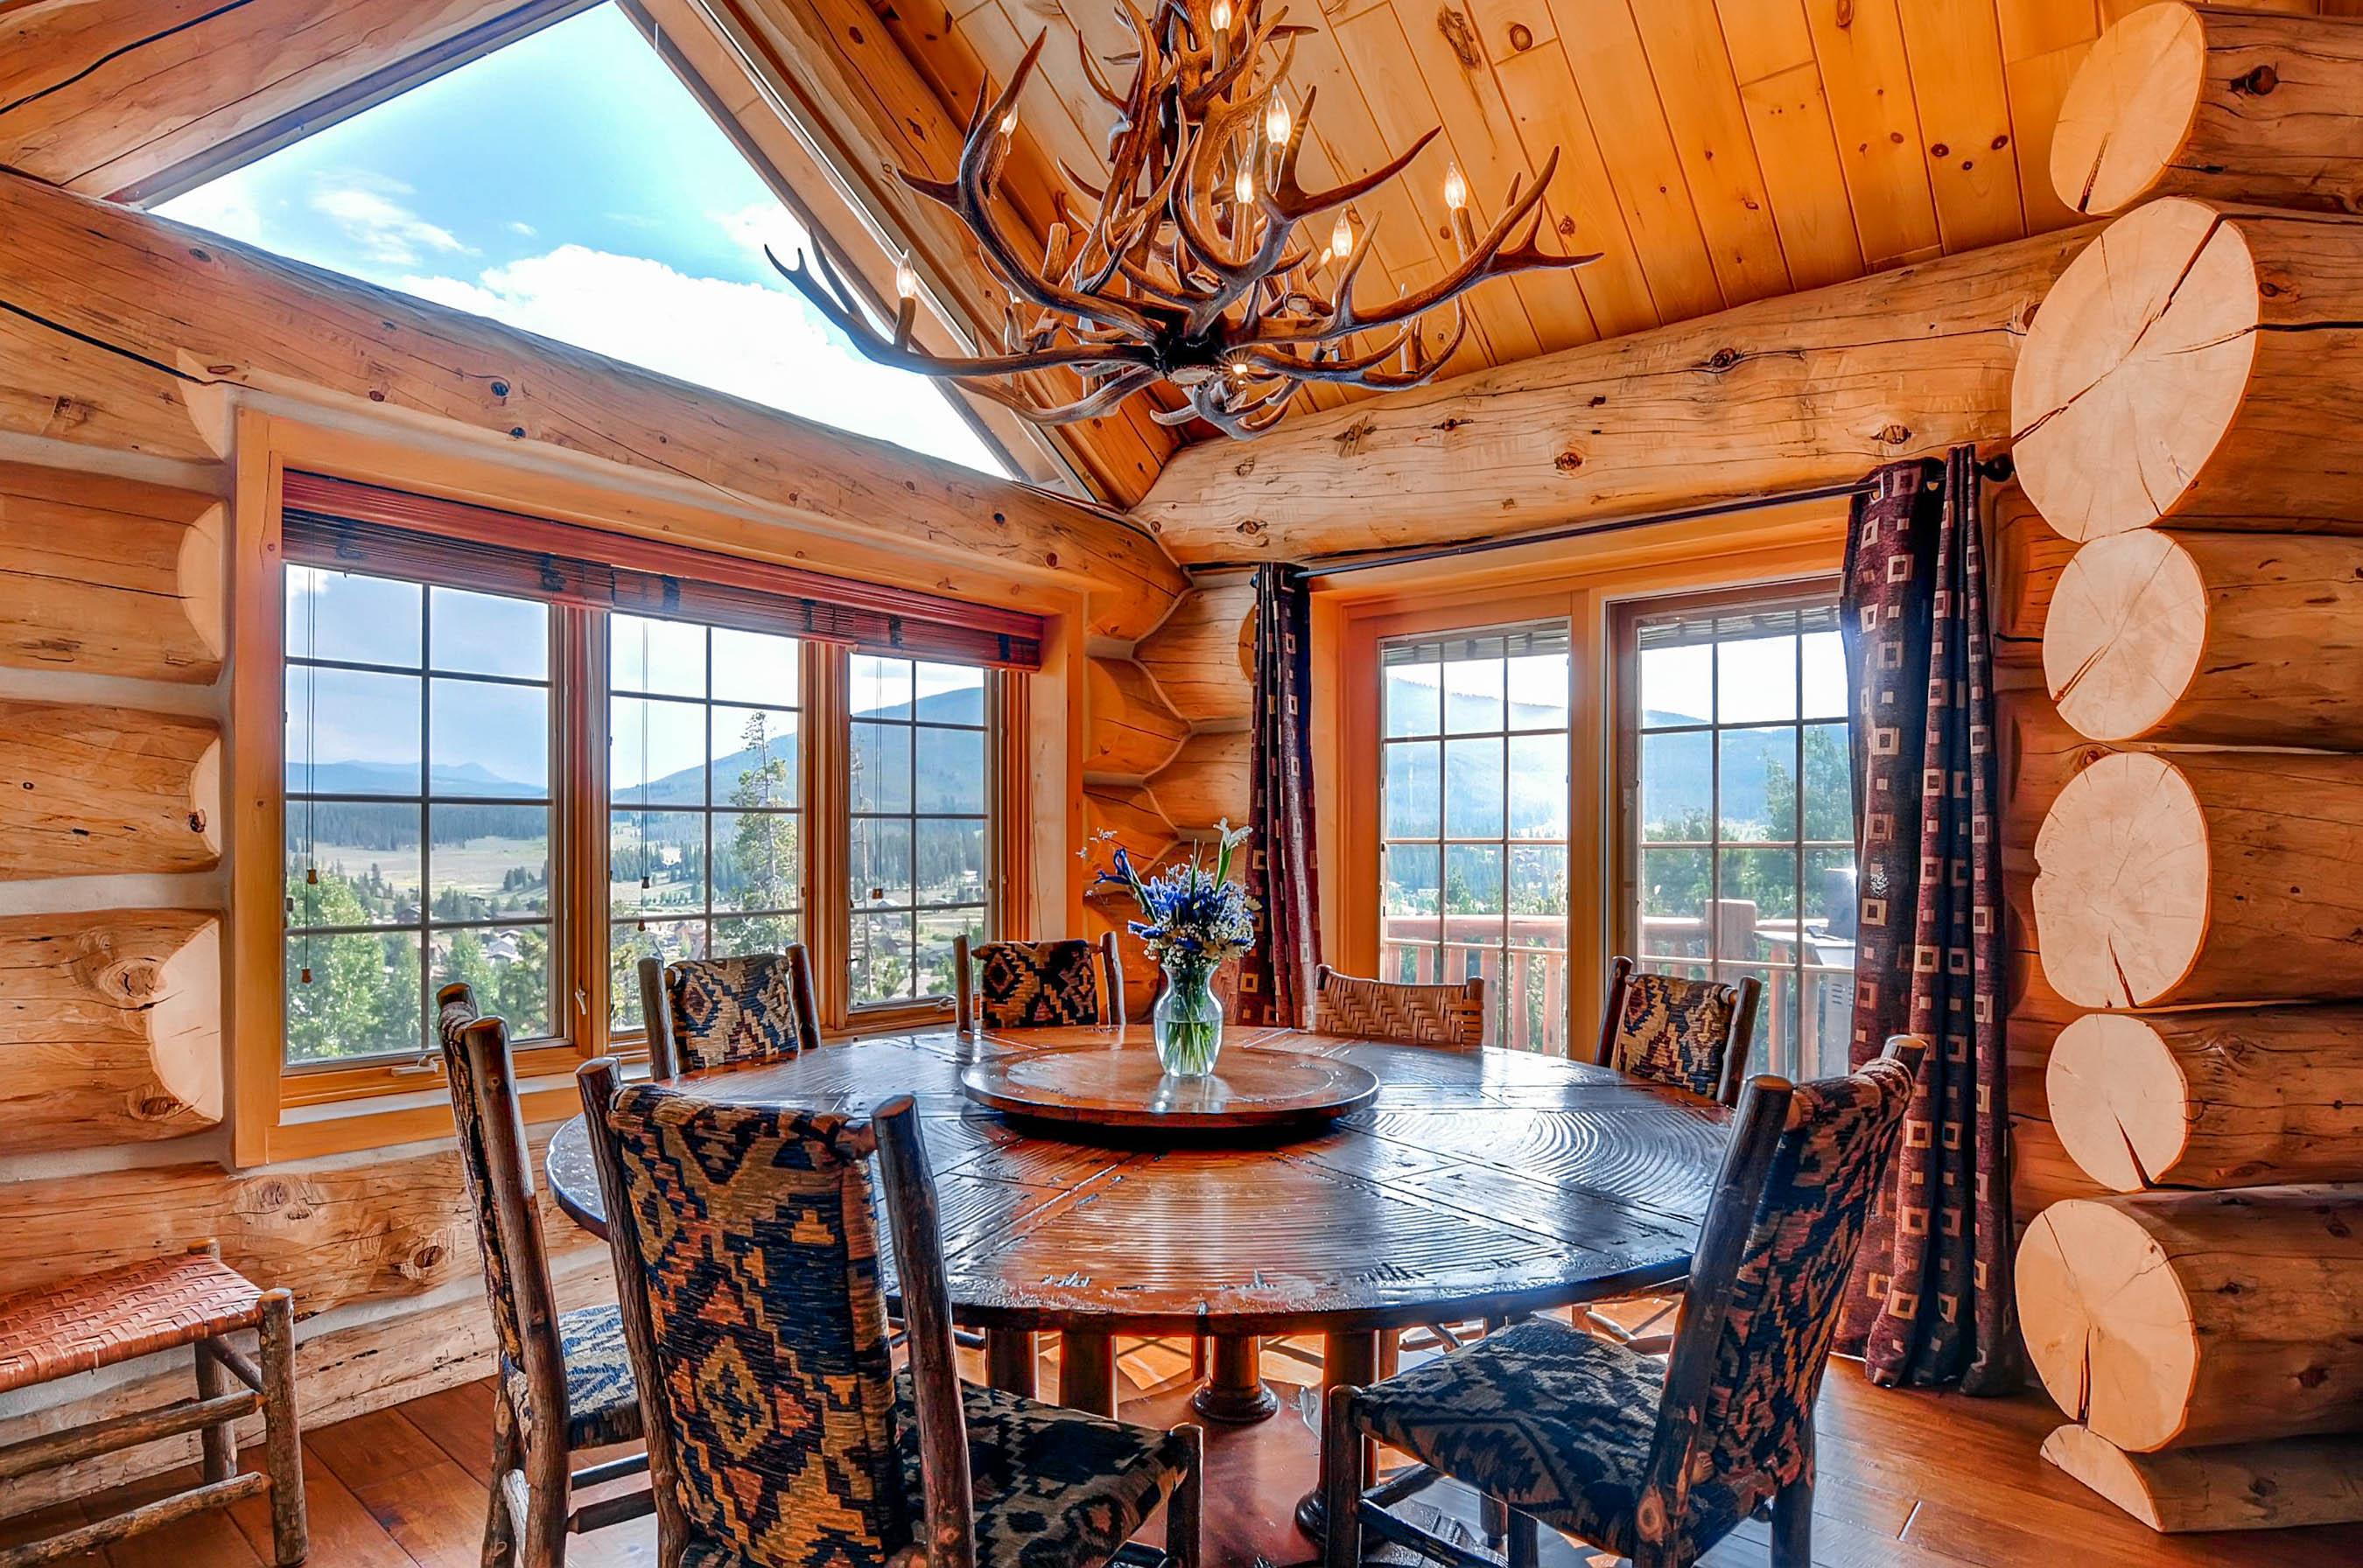 new breckenridge cabins superb mountains att white x fireplaces hampshire cabin